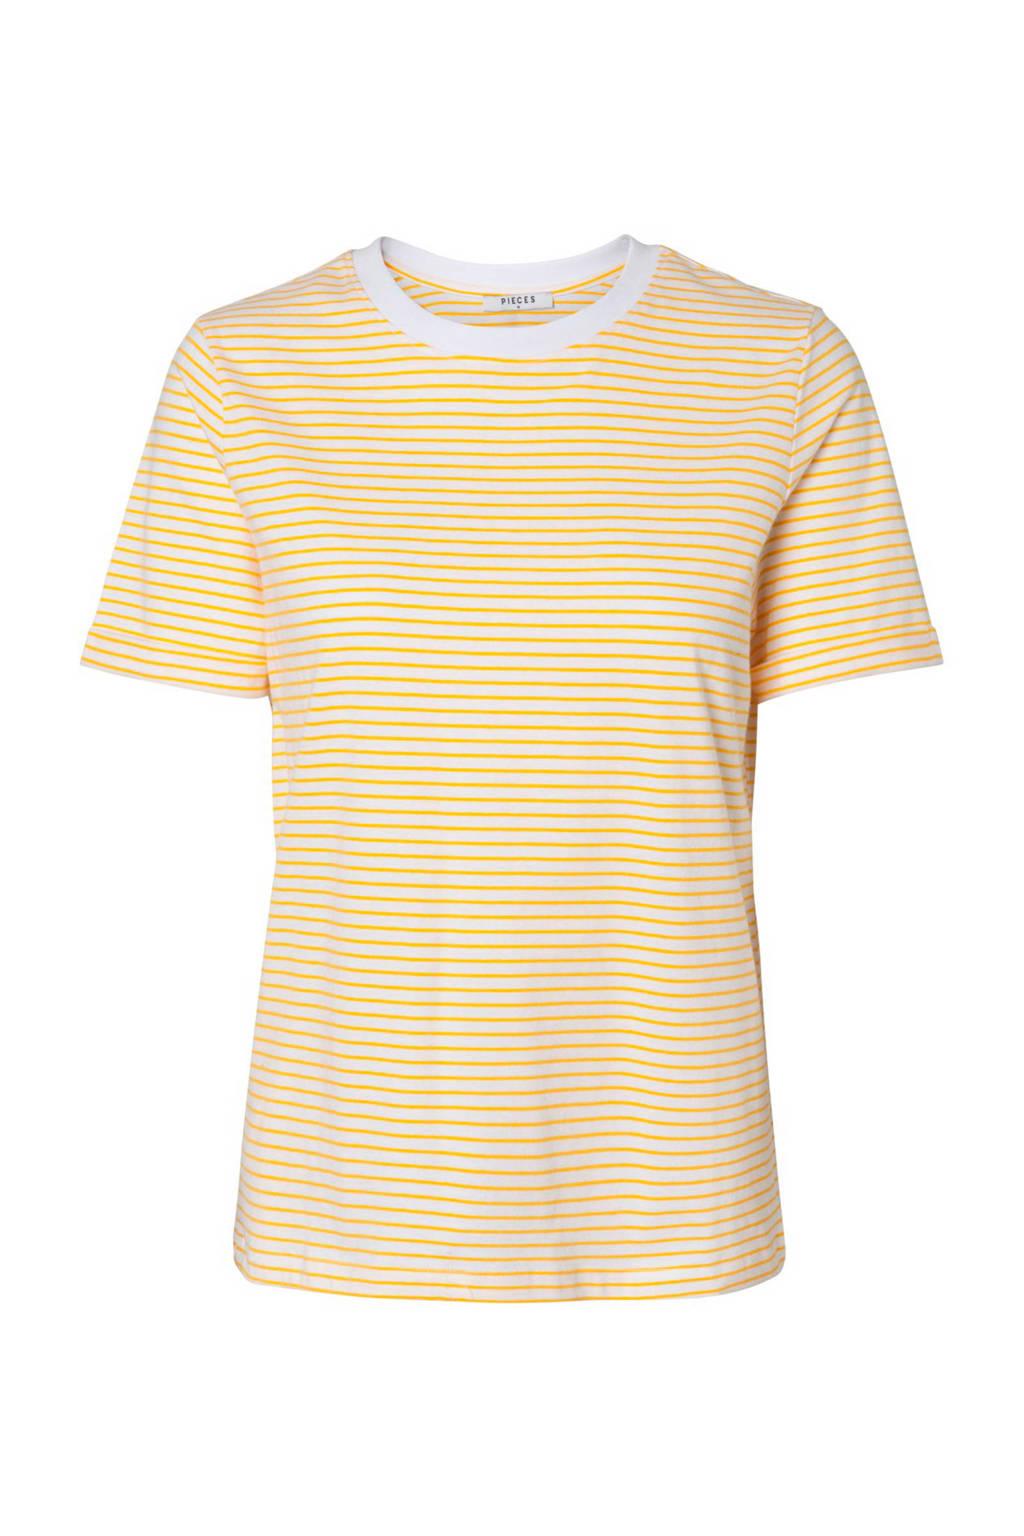 Piecesgestreept Piecesgestreept T T shirt T Piecesgestreept shirt Piecesgestreept Piecesgestreept shirt shirt T S68w4qzg